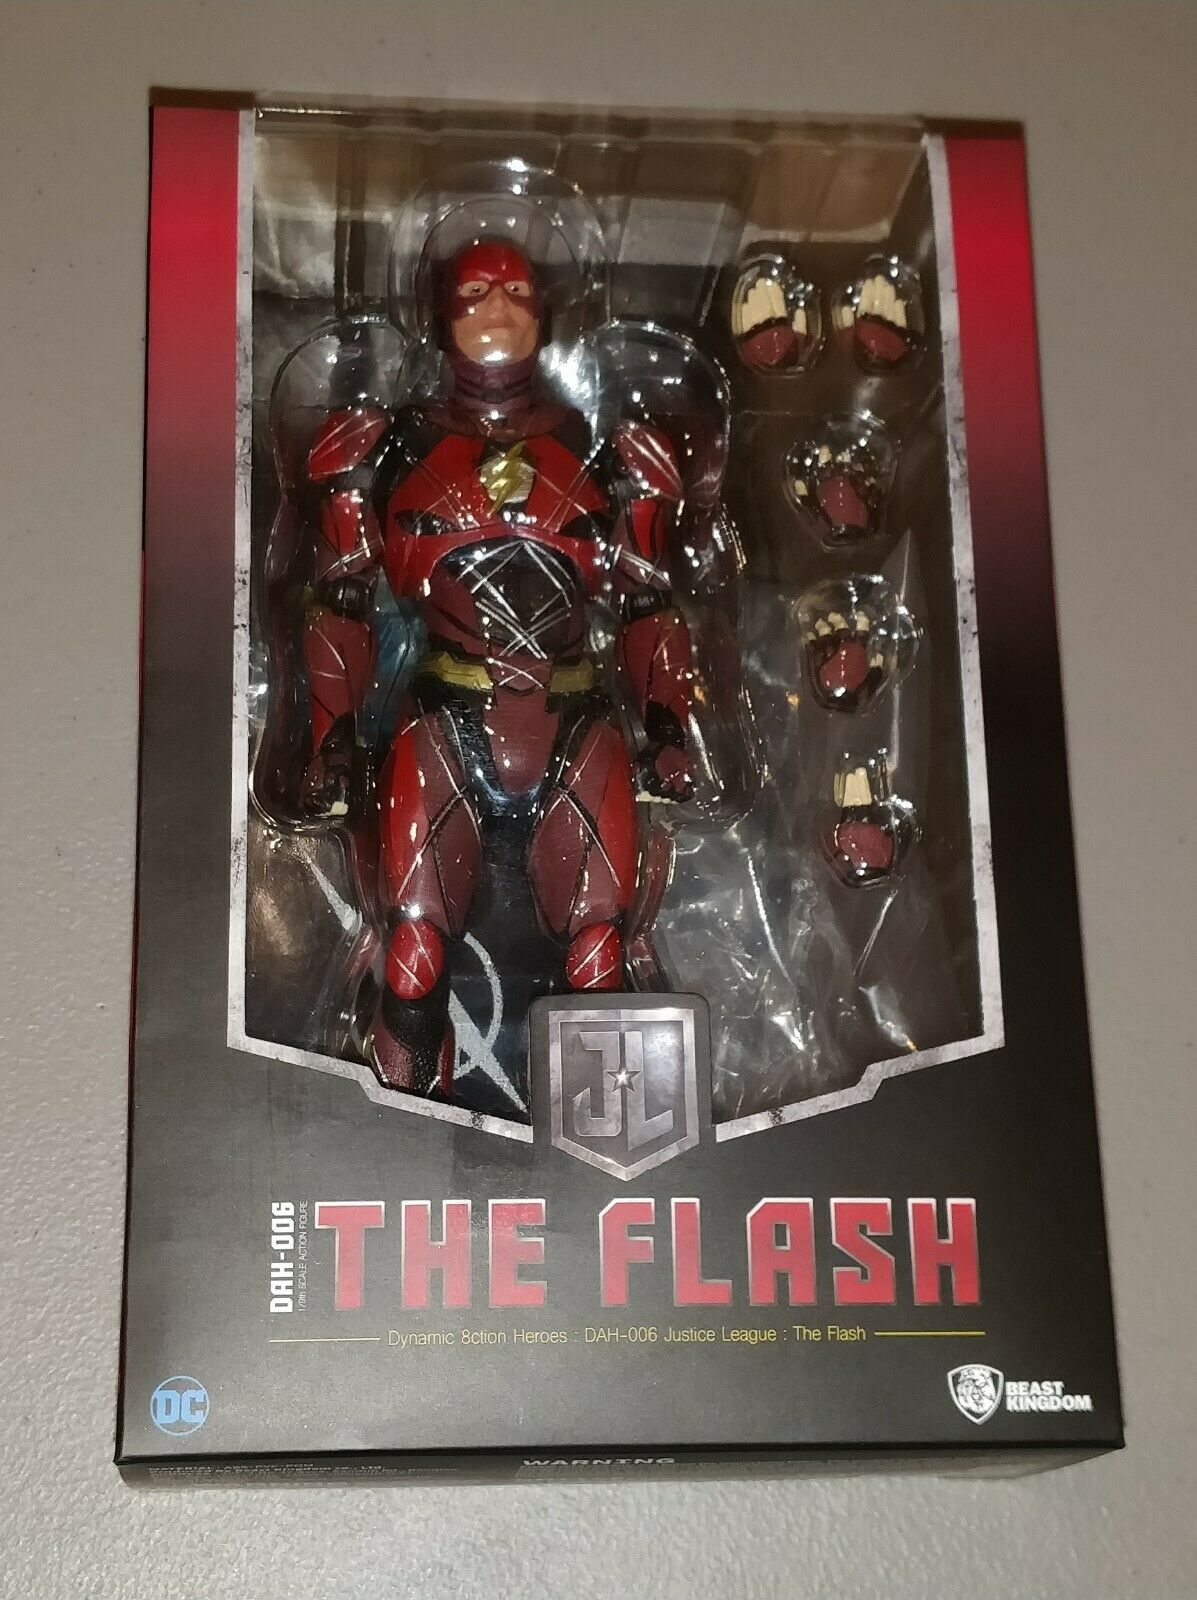 The Flash Dynamic 8ction Heroes DAH006 Justice League